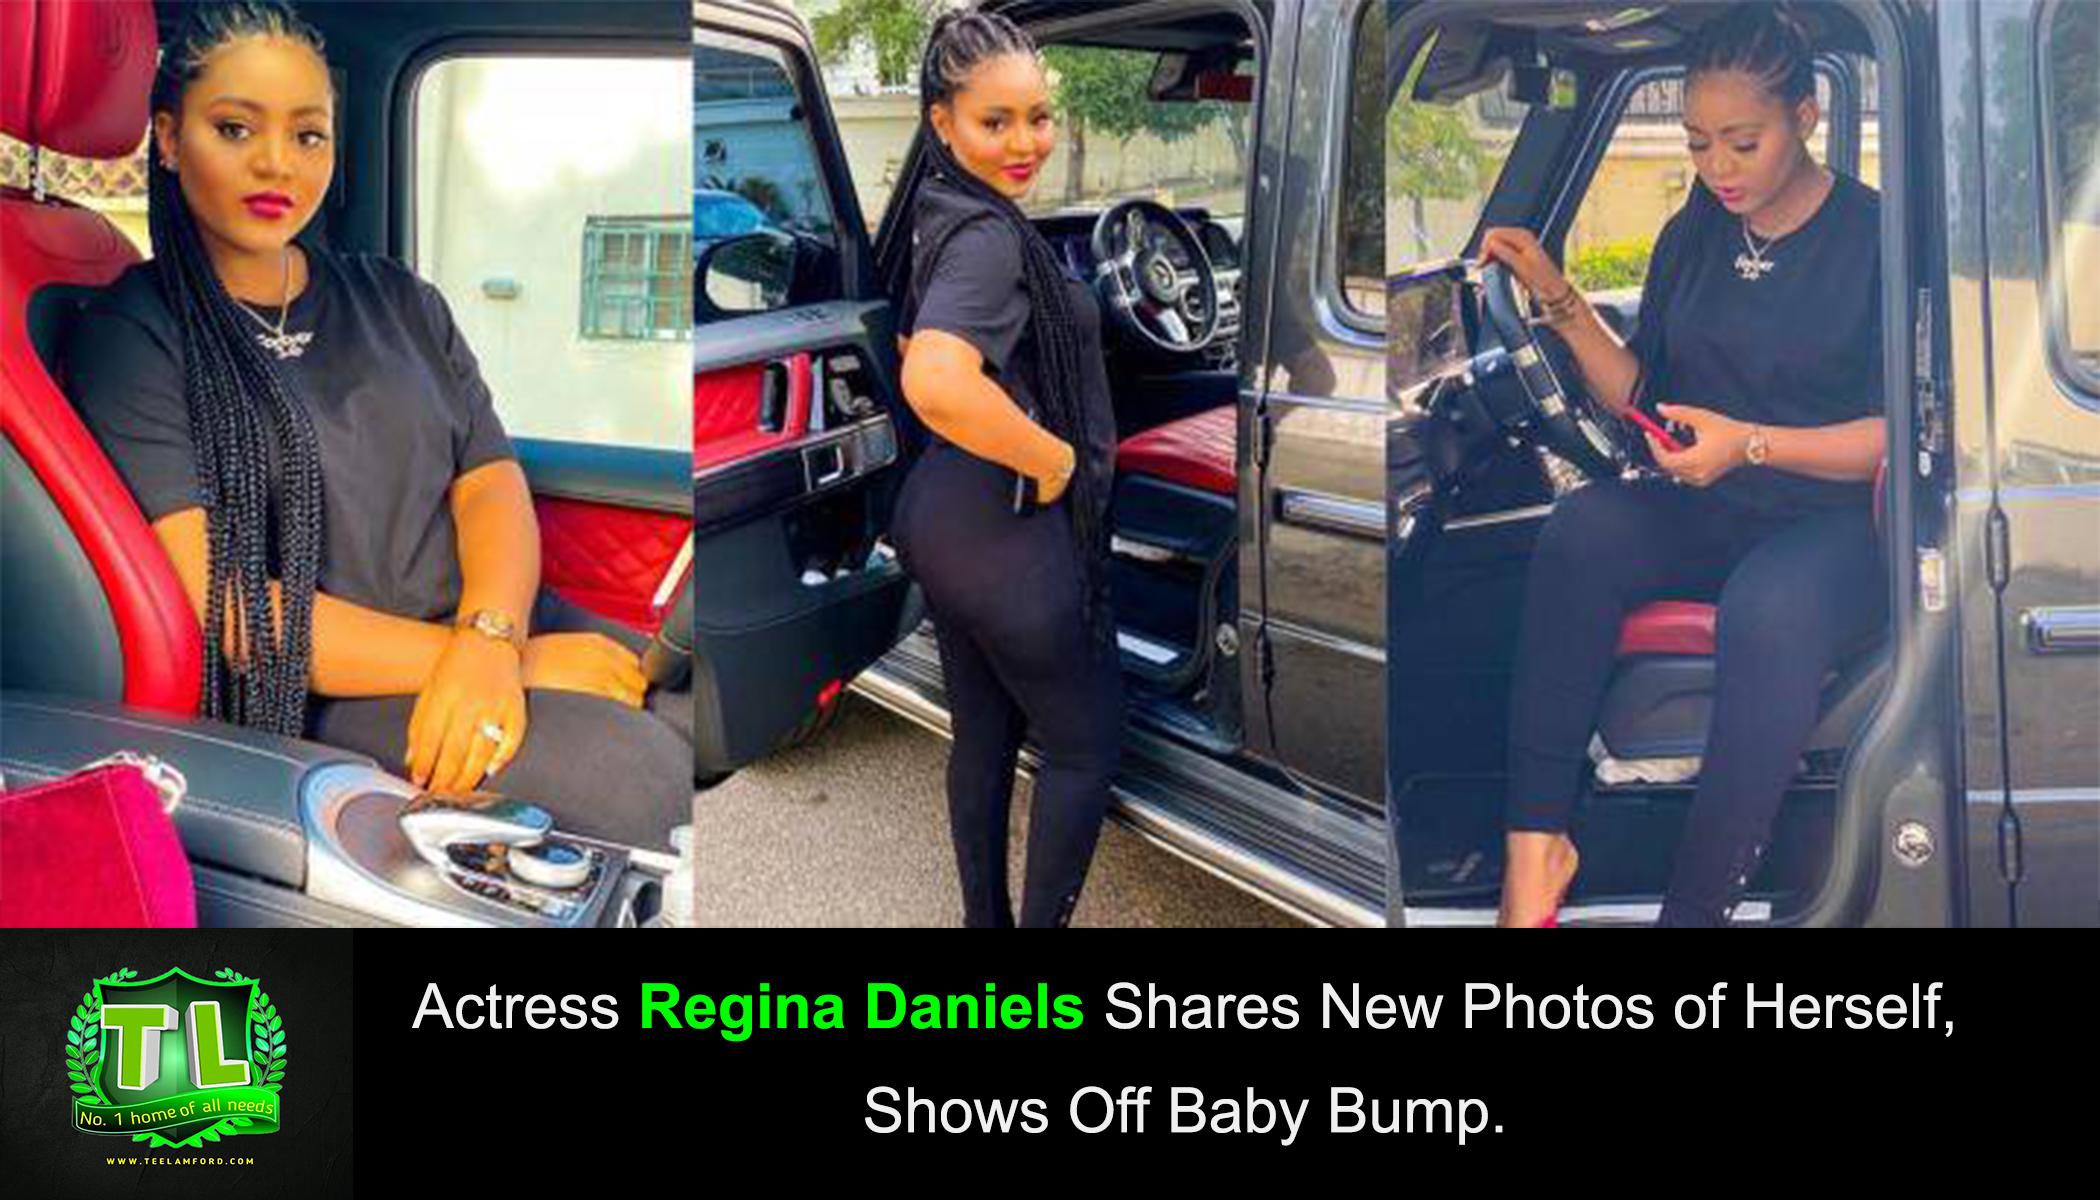 Actress-Regina-Daniels-Shares-New-Photos-of-Herself-Shows-Off-Baby-Bump-Teelamford